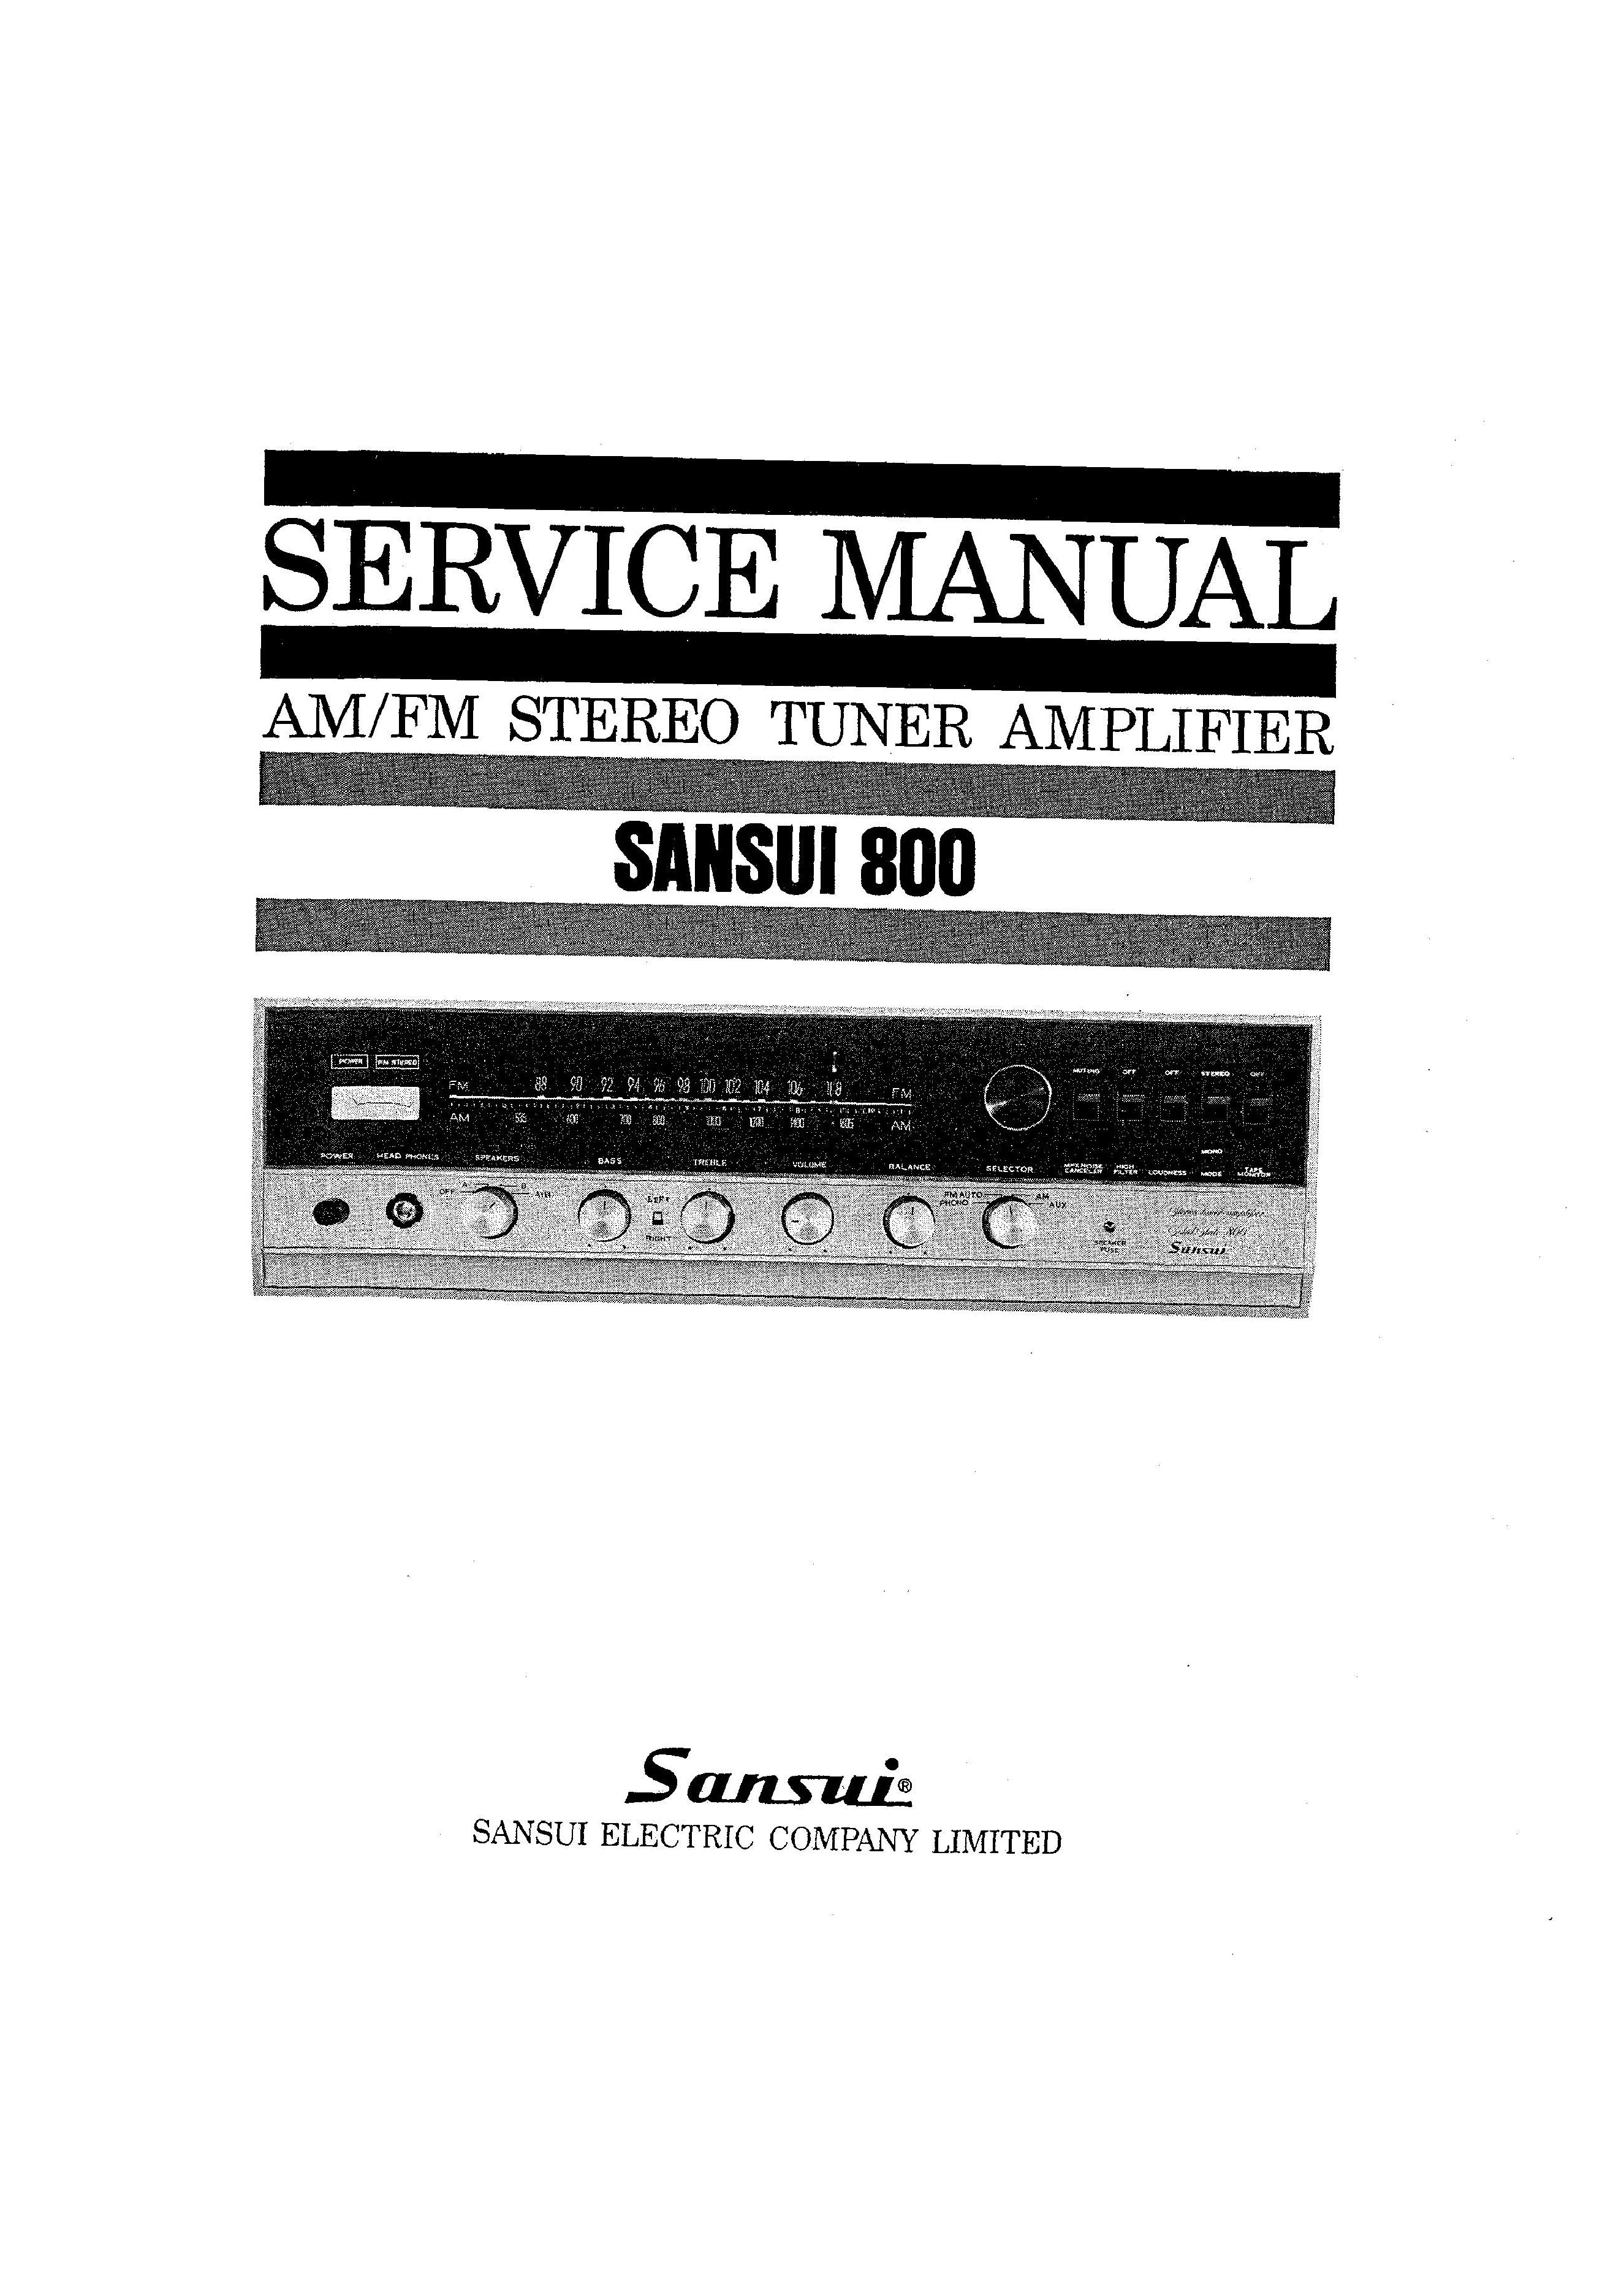 service manual for sansui 800